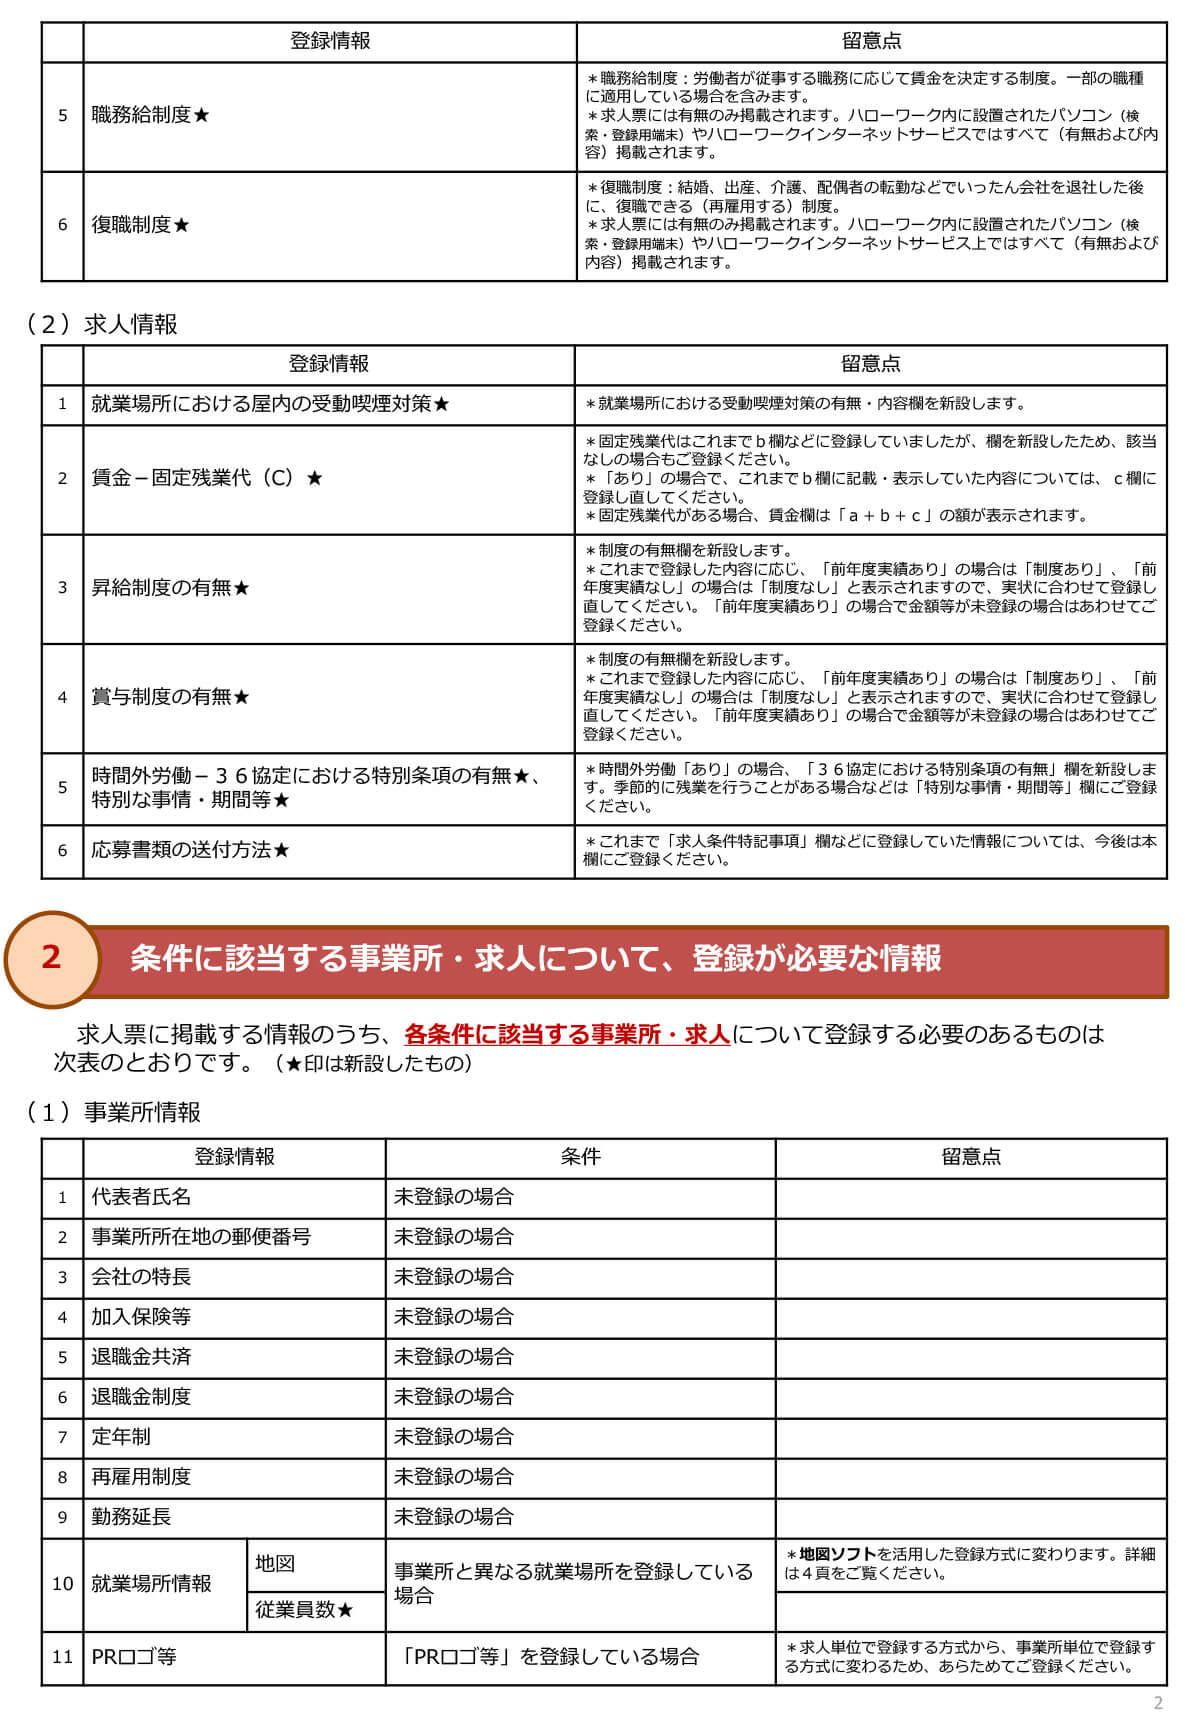 20200106-5-job_posting-2-2